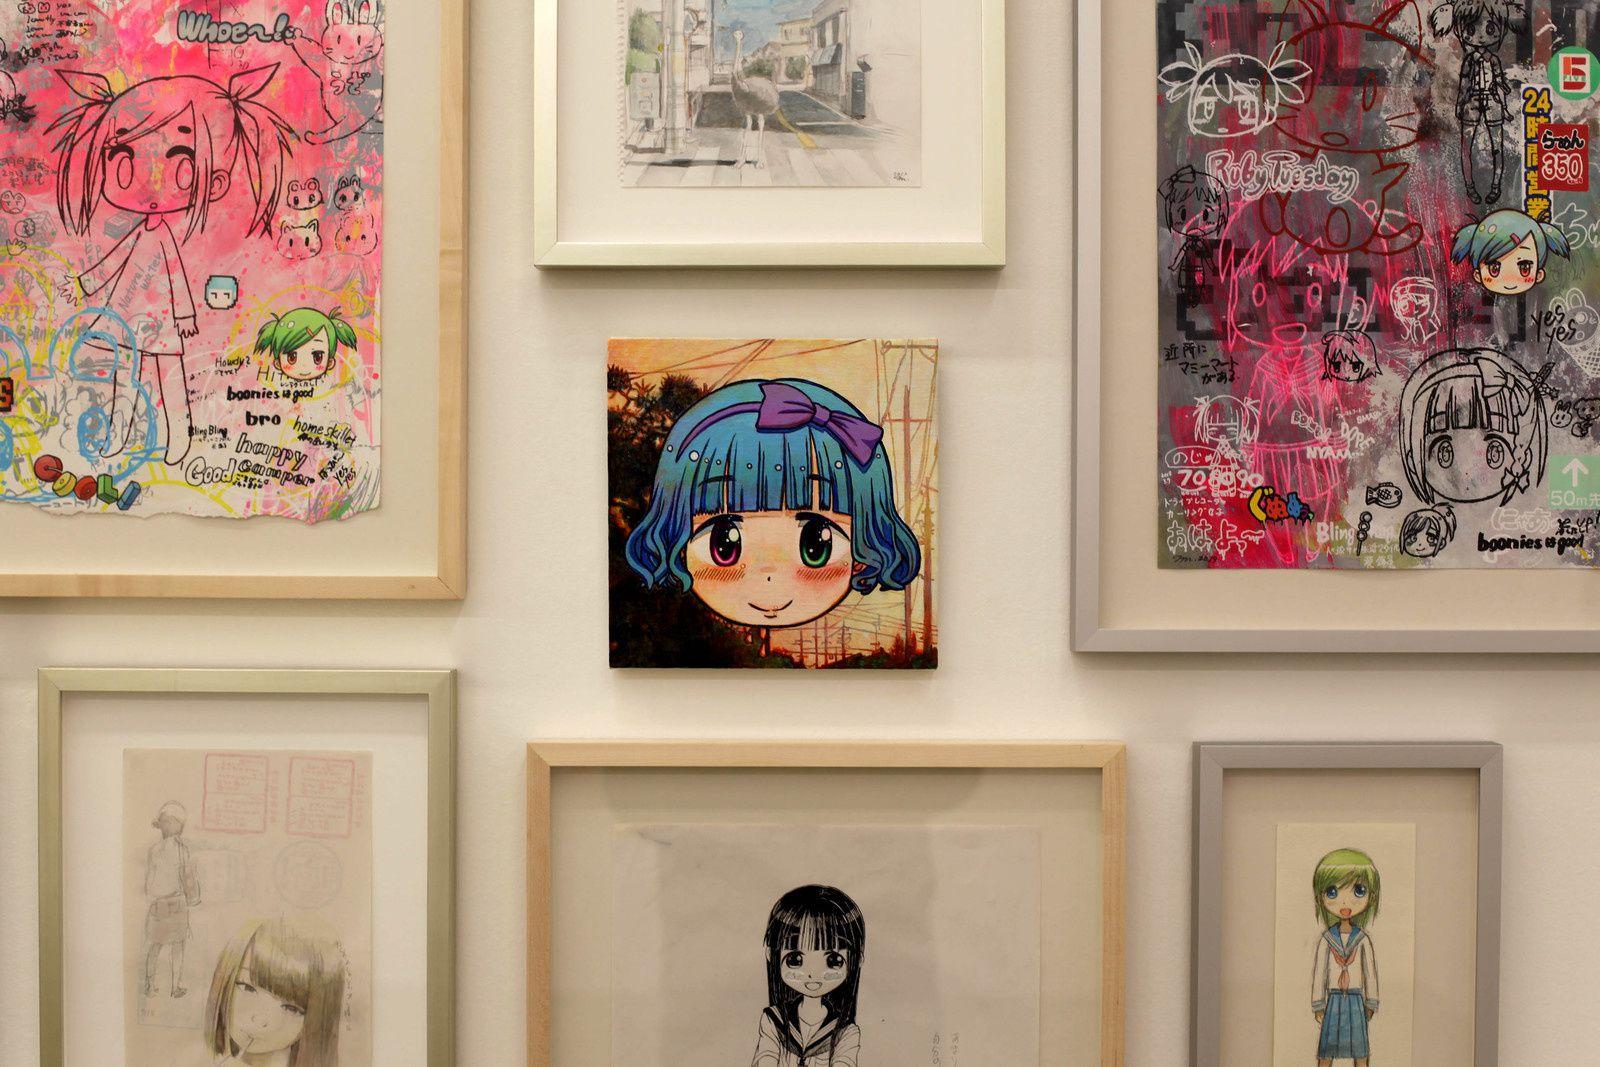 """Yui - Dusk 16:45pm"", 2018 de MR. - Courtesy Galerie Perrotin © Photo Éric Simon"